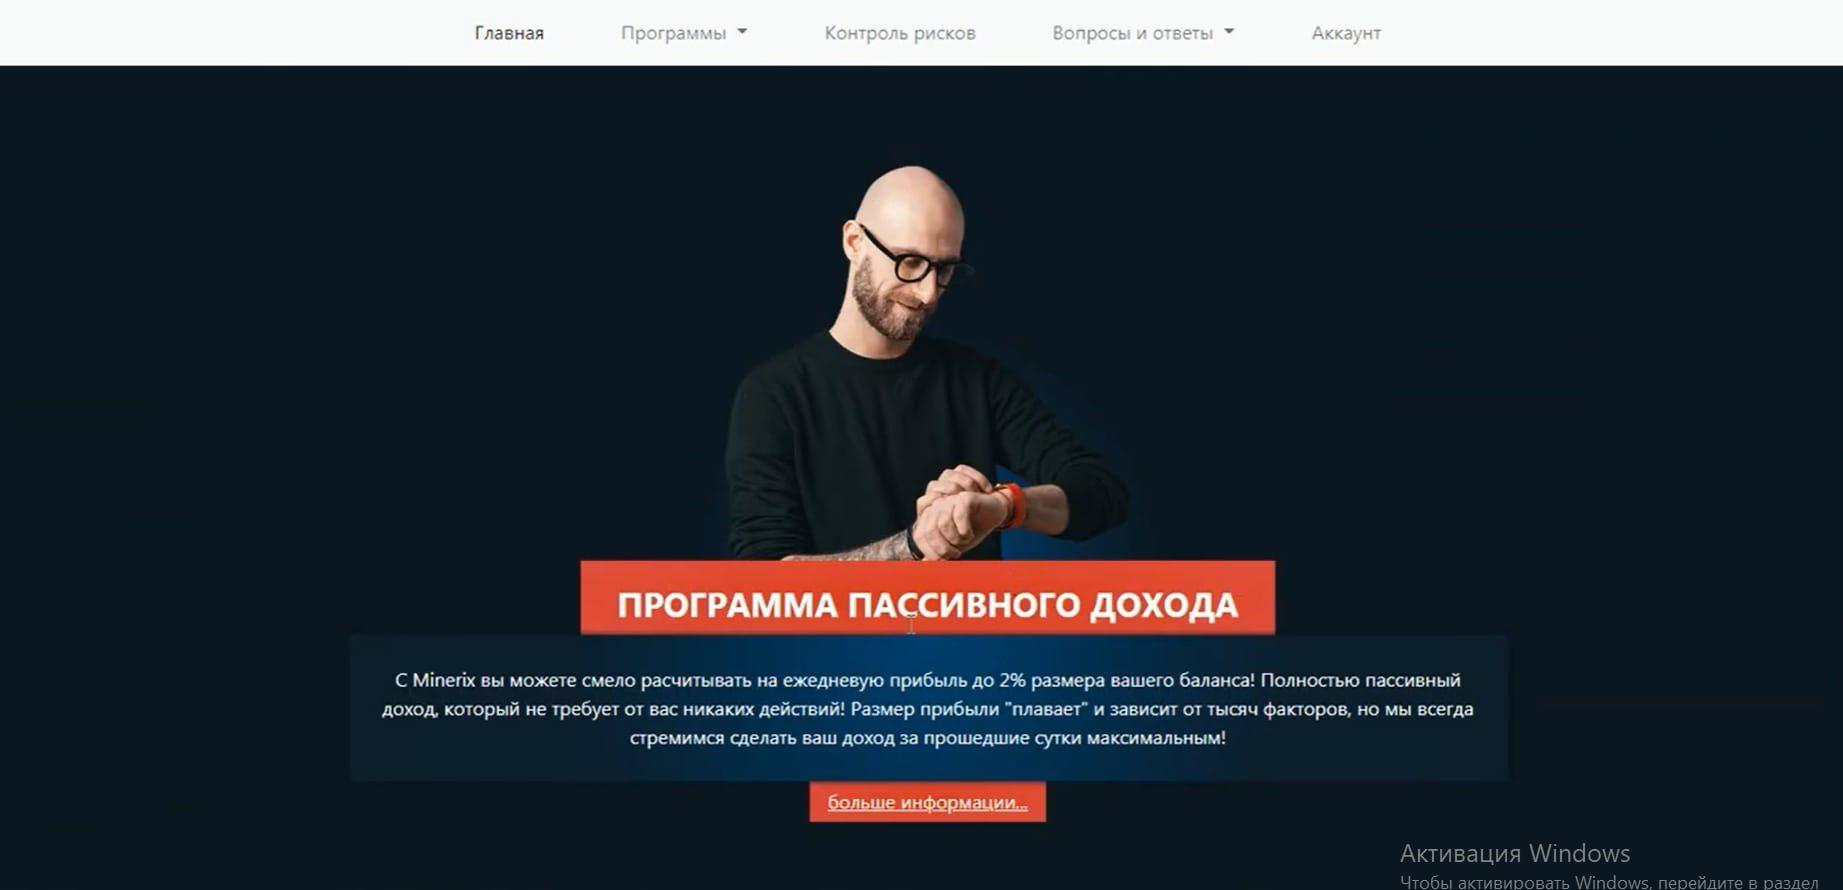 Minerix bot - программа пассивного дохода